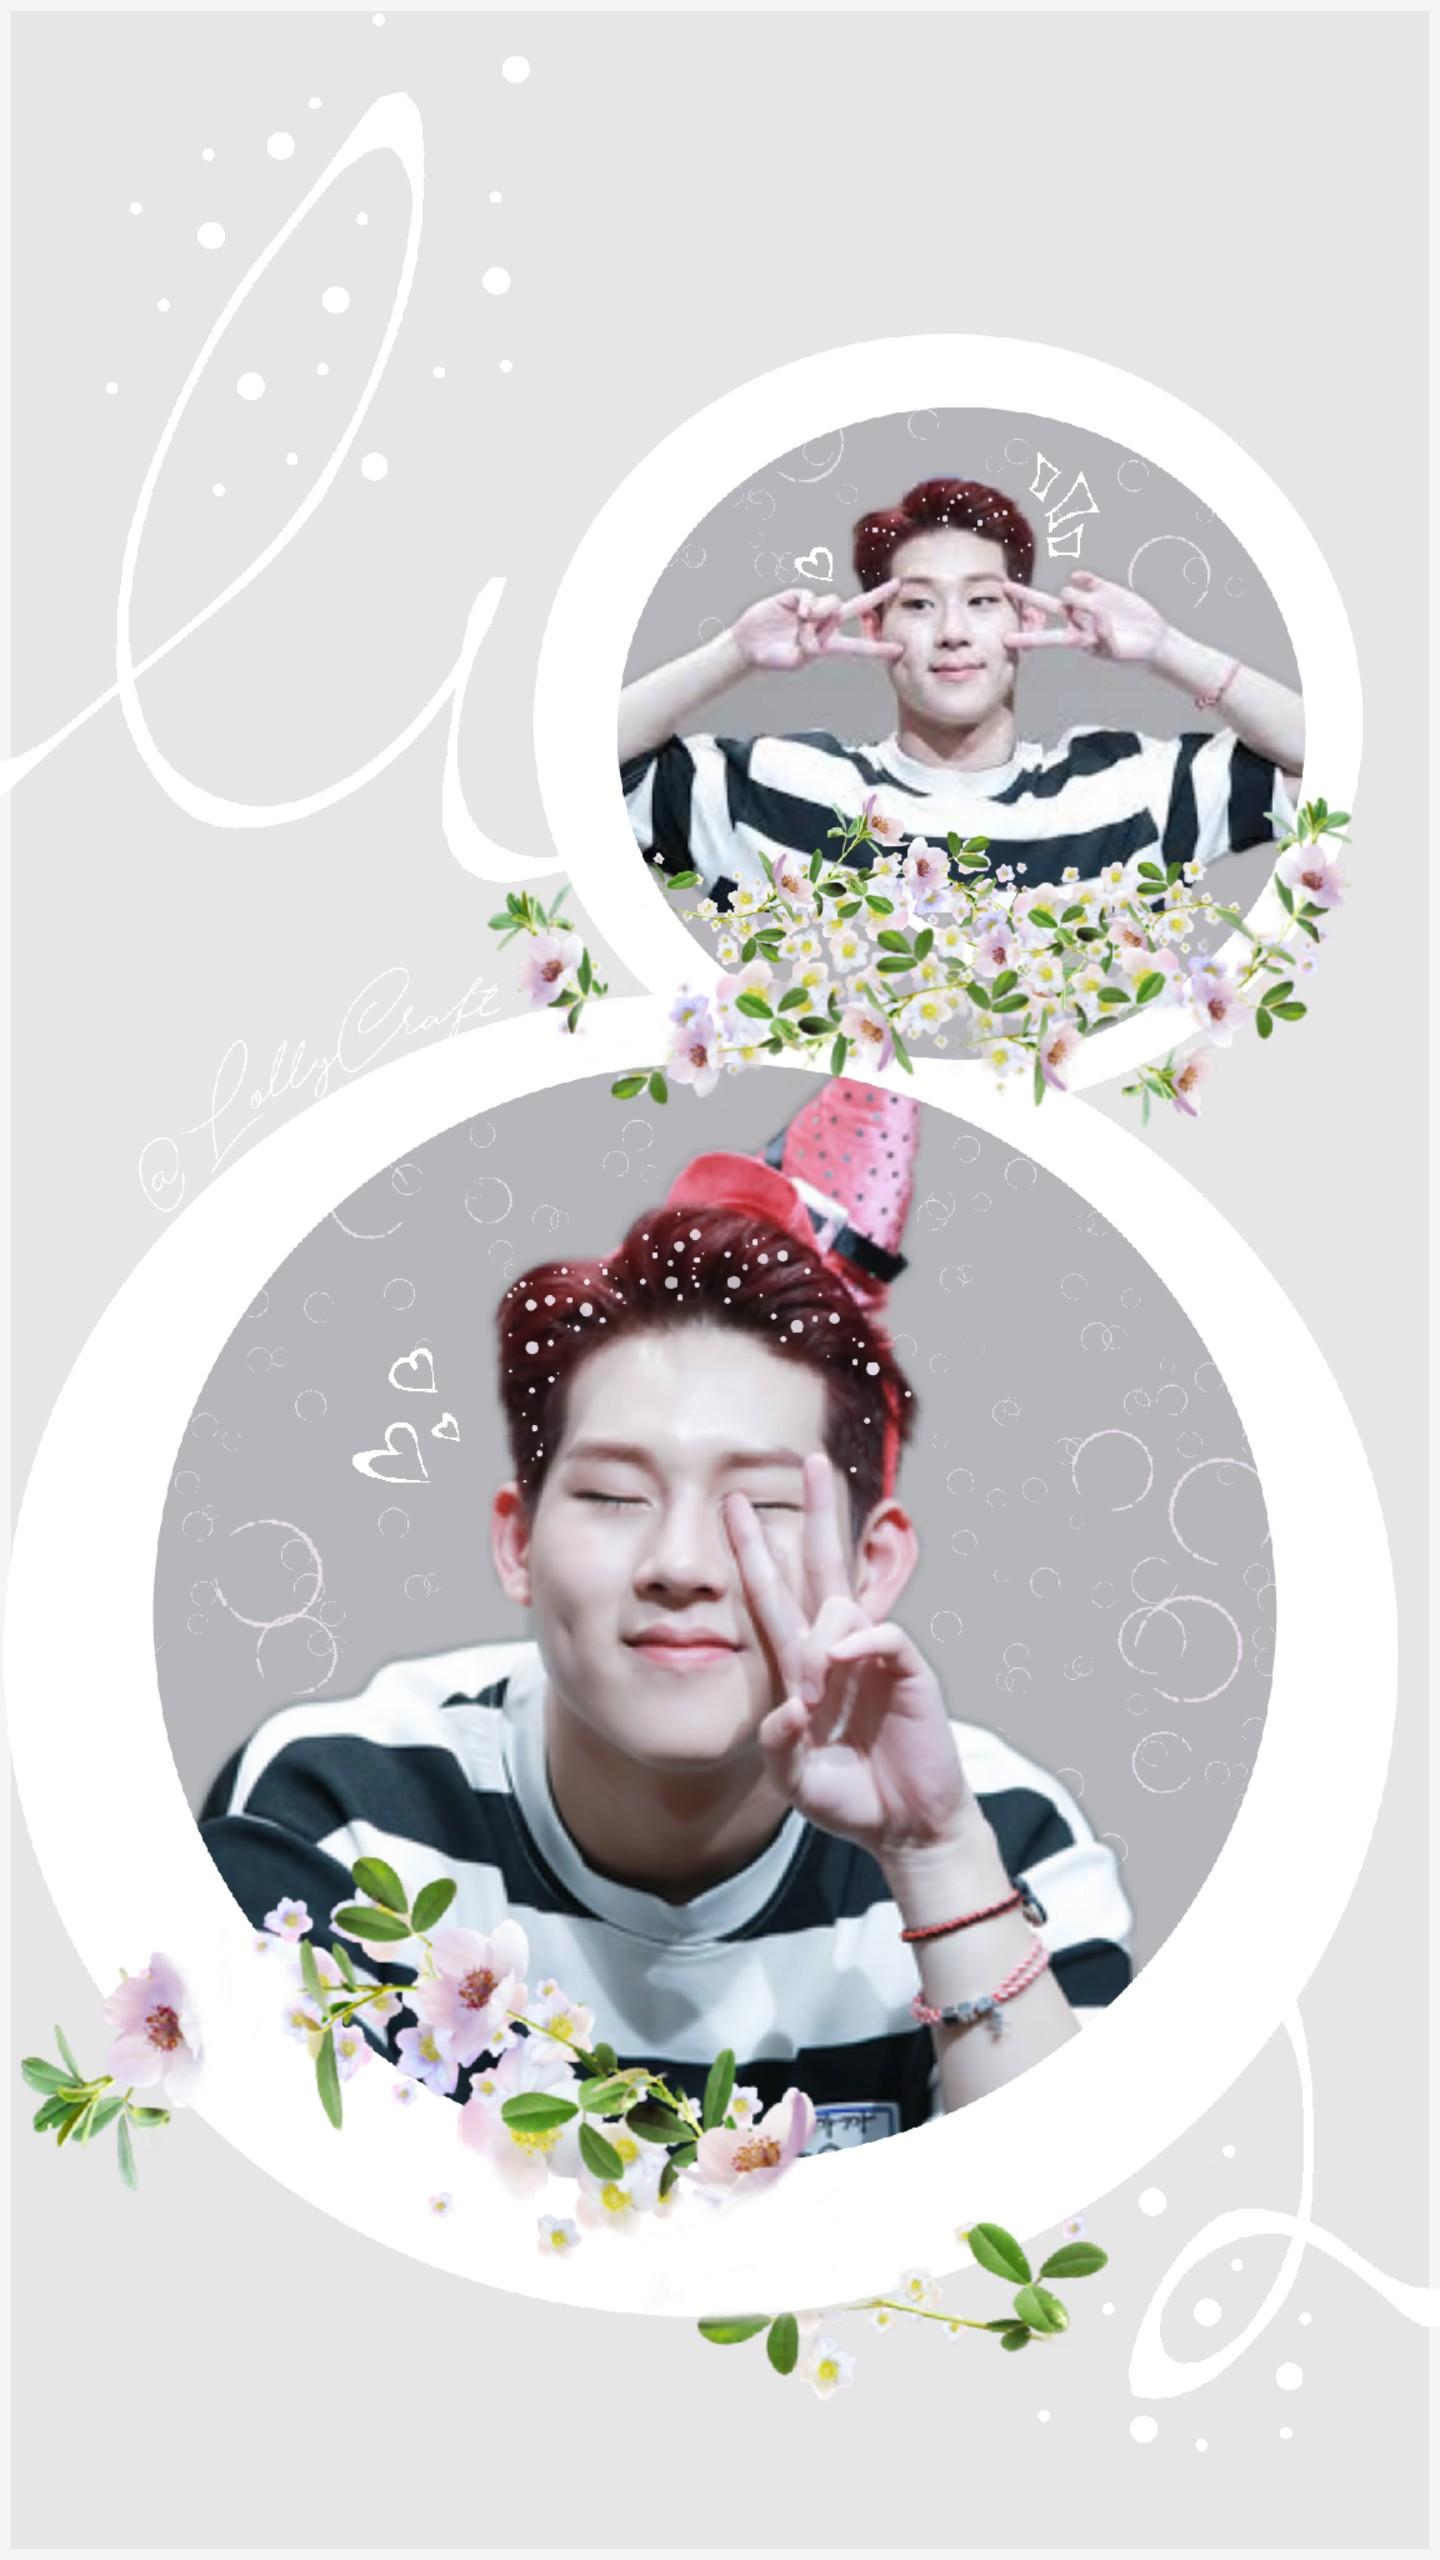 Jooheon Monsta X For My Darling Pasteljin Hope Illustration 3079331 Hd Wallpaper Backgrounds Download